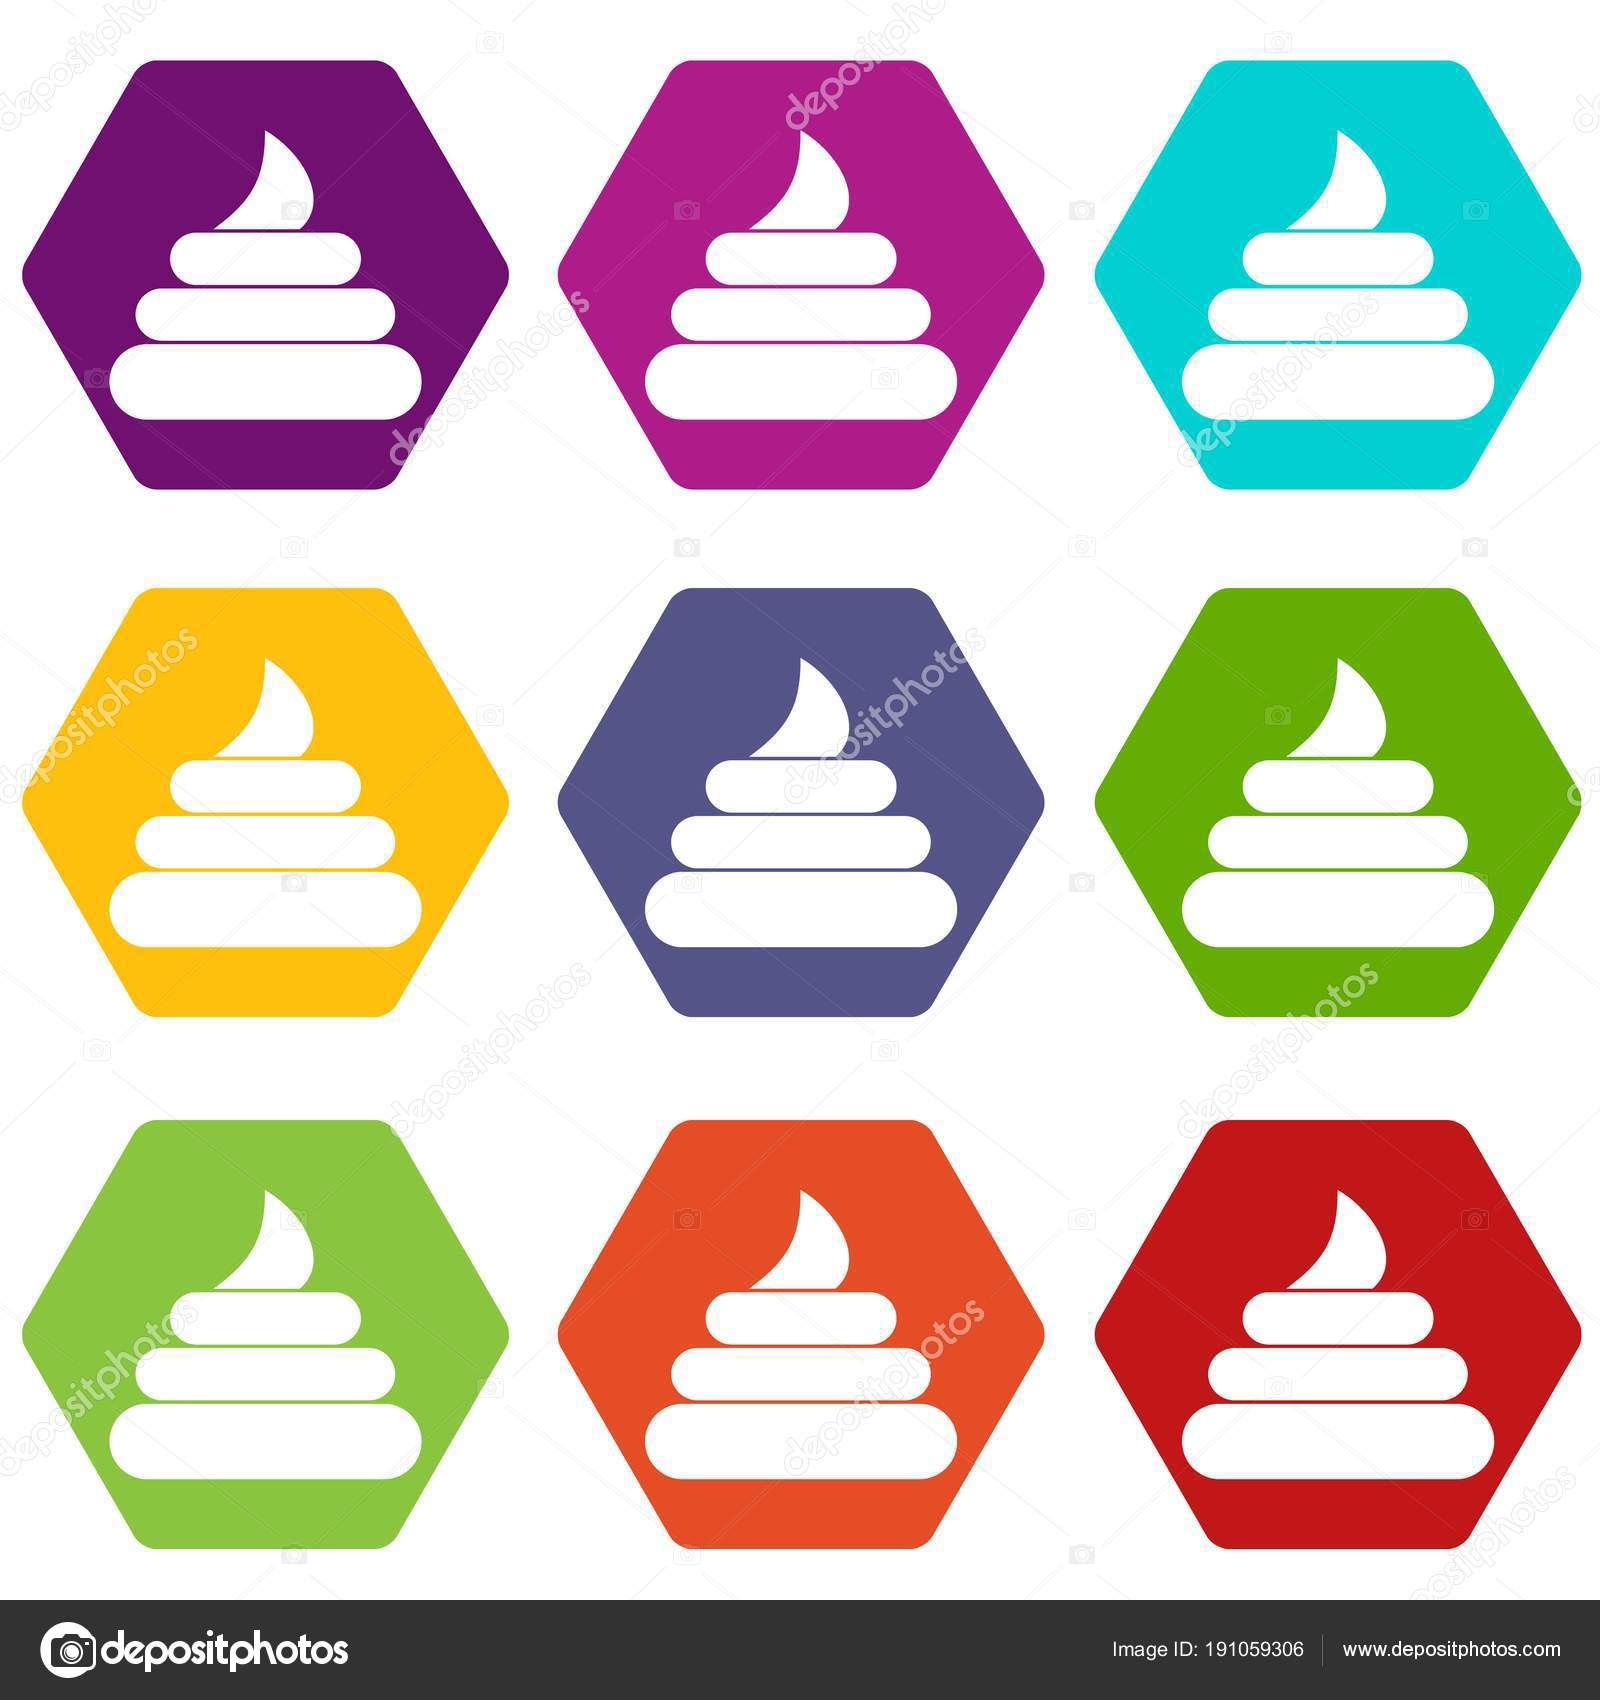 Stuhlgang Symbolsatz Farbe Hexaeder Stockvektor Ylivdesign